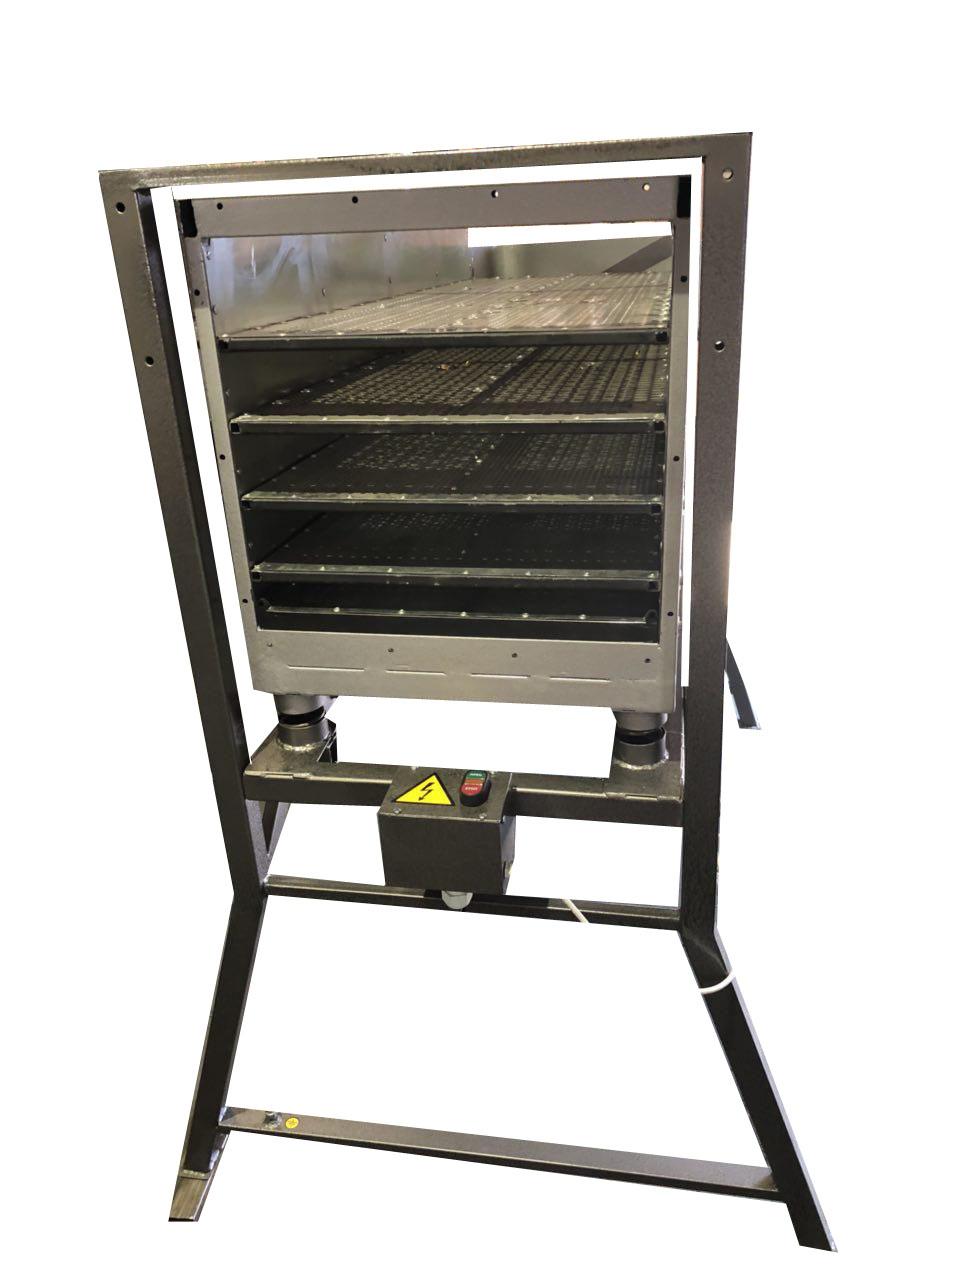 Вибросито для сортировки ядра грецкого ореха (300 кг/ч) - 3